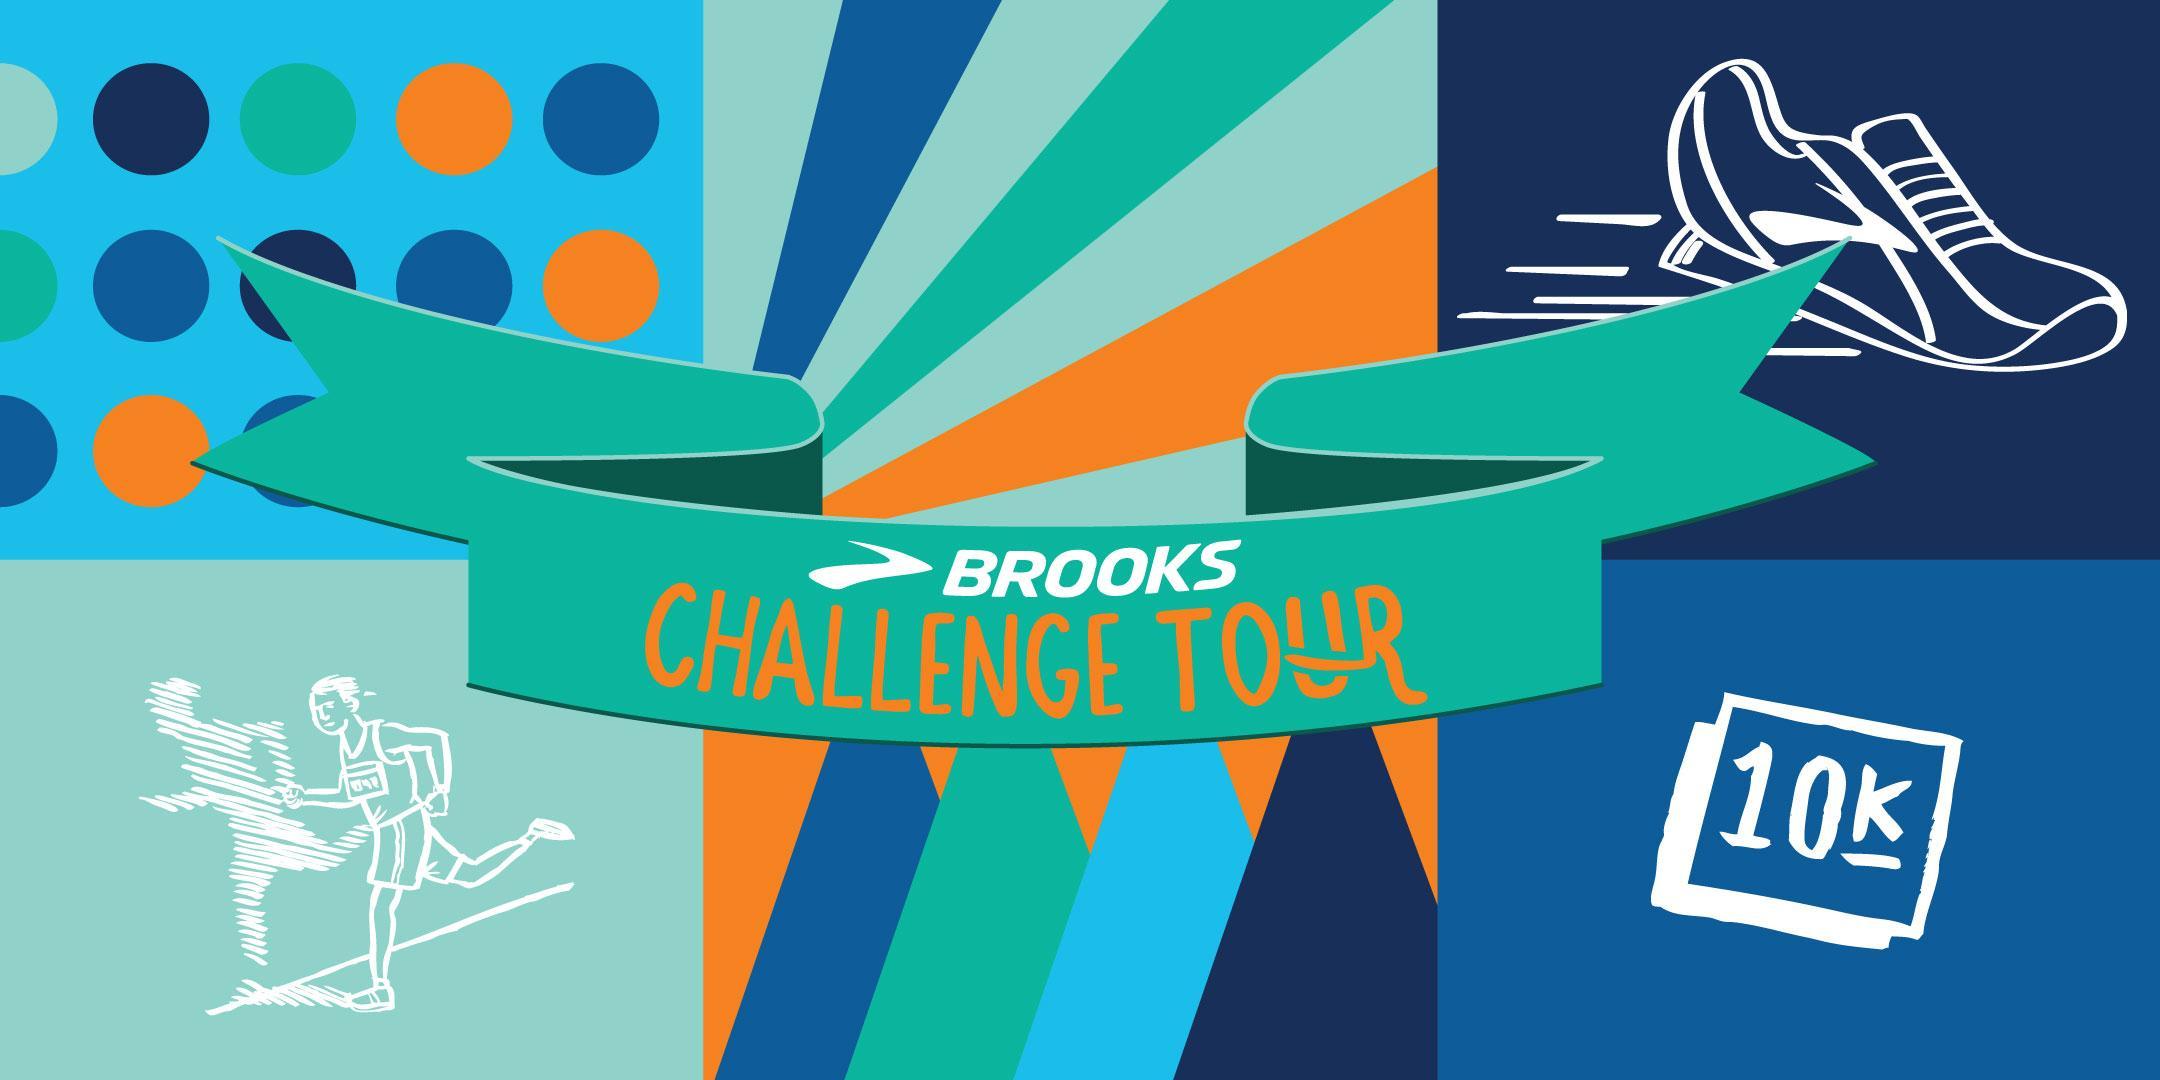 BROOKS CHALLENGE TOUR - FREE RUN, CARPI (MO)